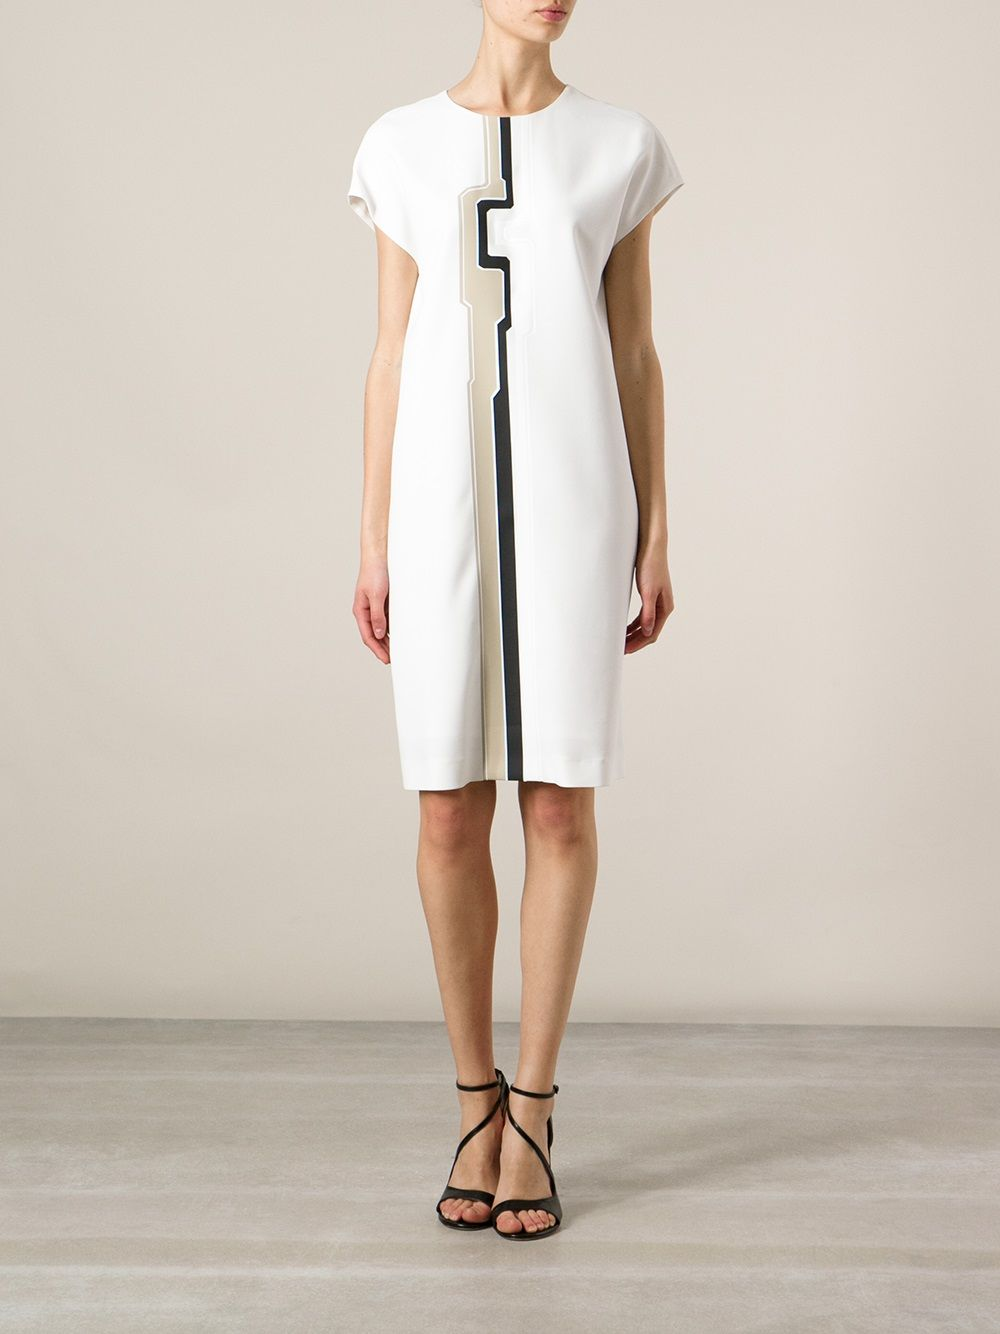 Fendi Geometric Line Printed Dress Farfetch Com Print Dress Dresses Day Dresses [ 1334 x 1000 Pixel ]